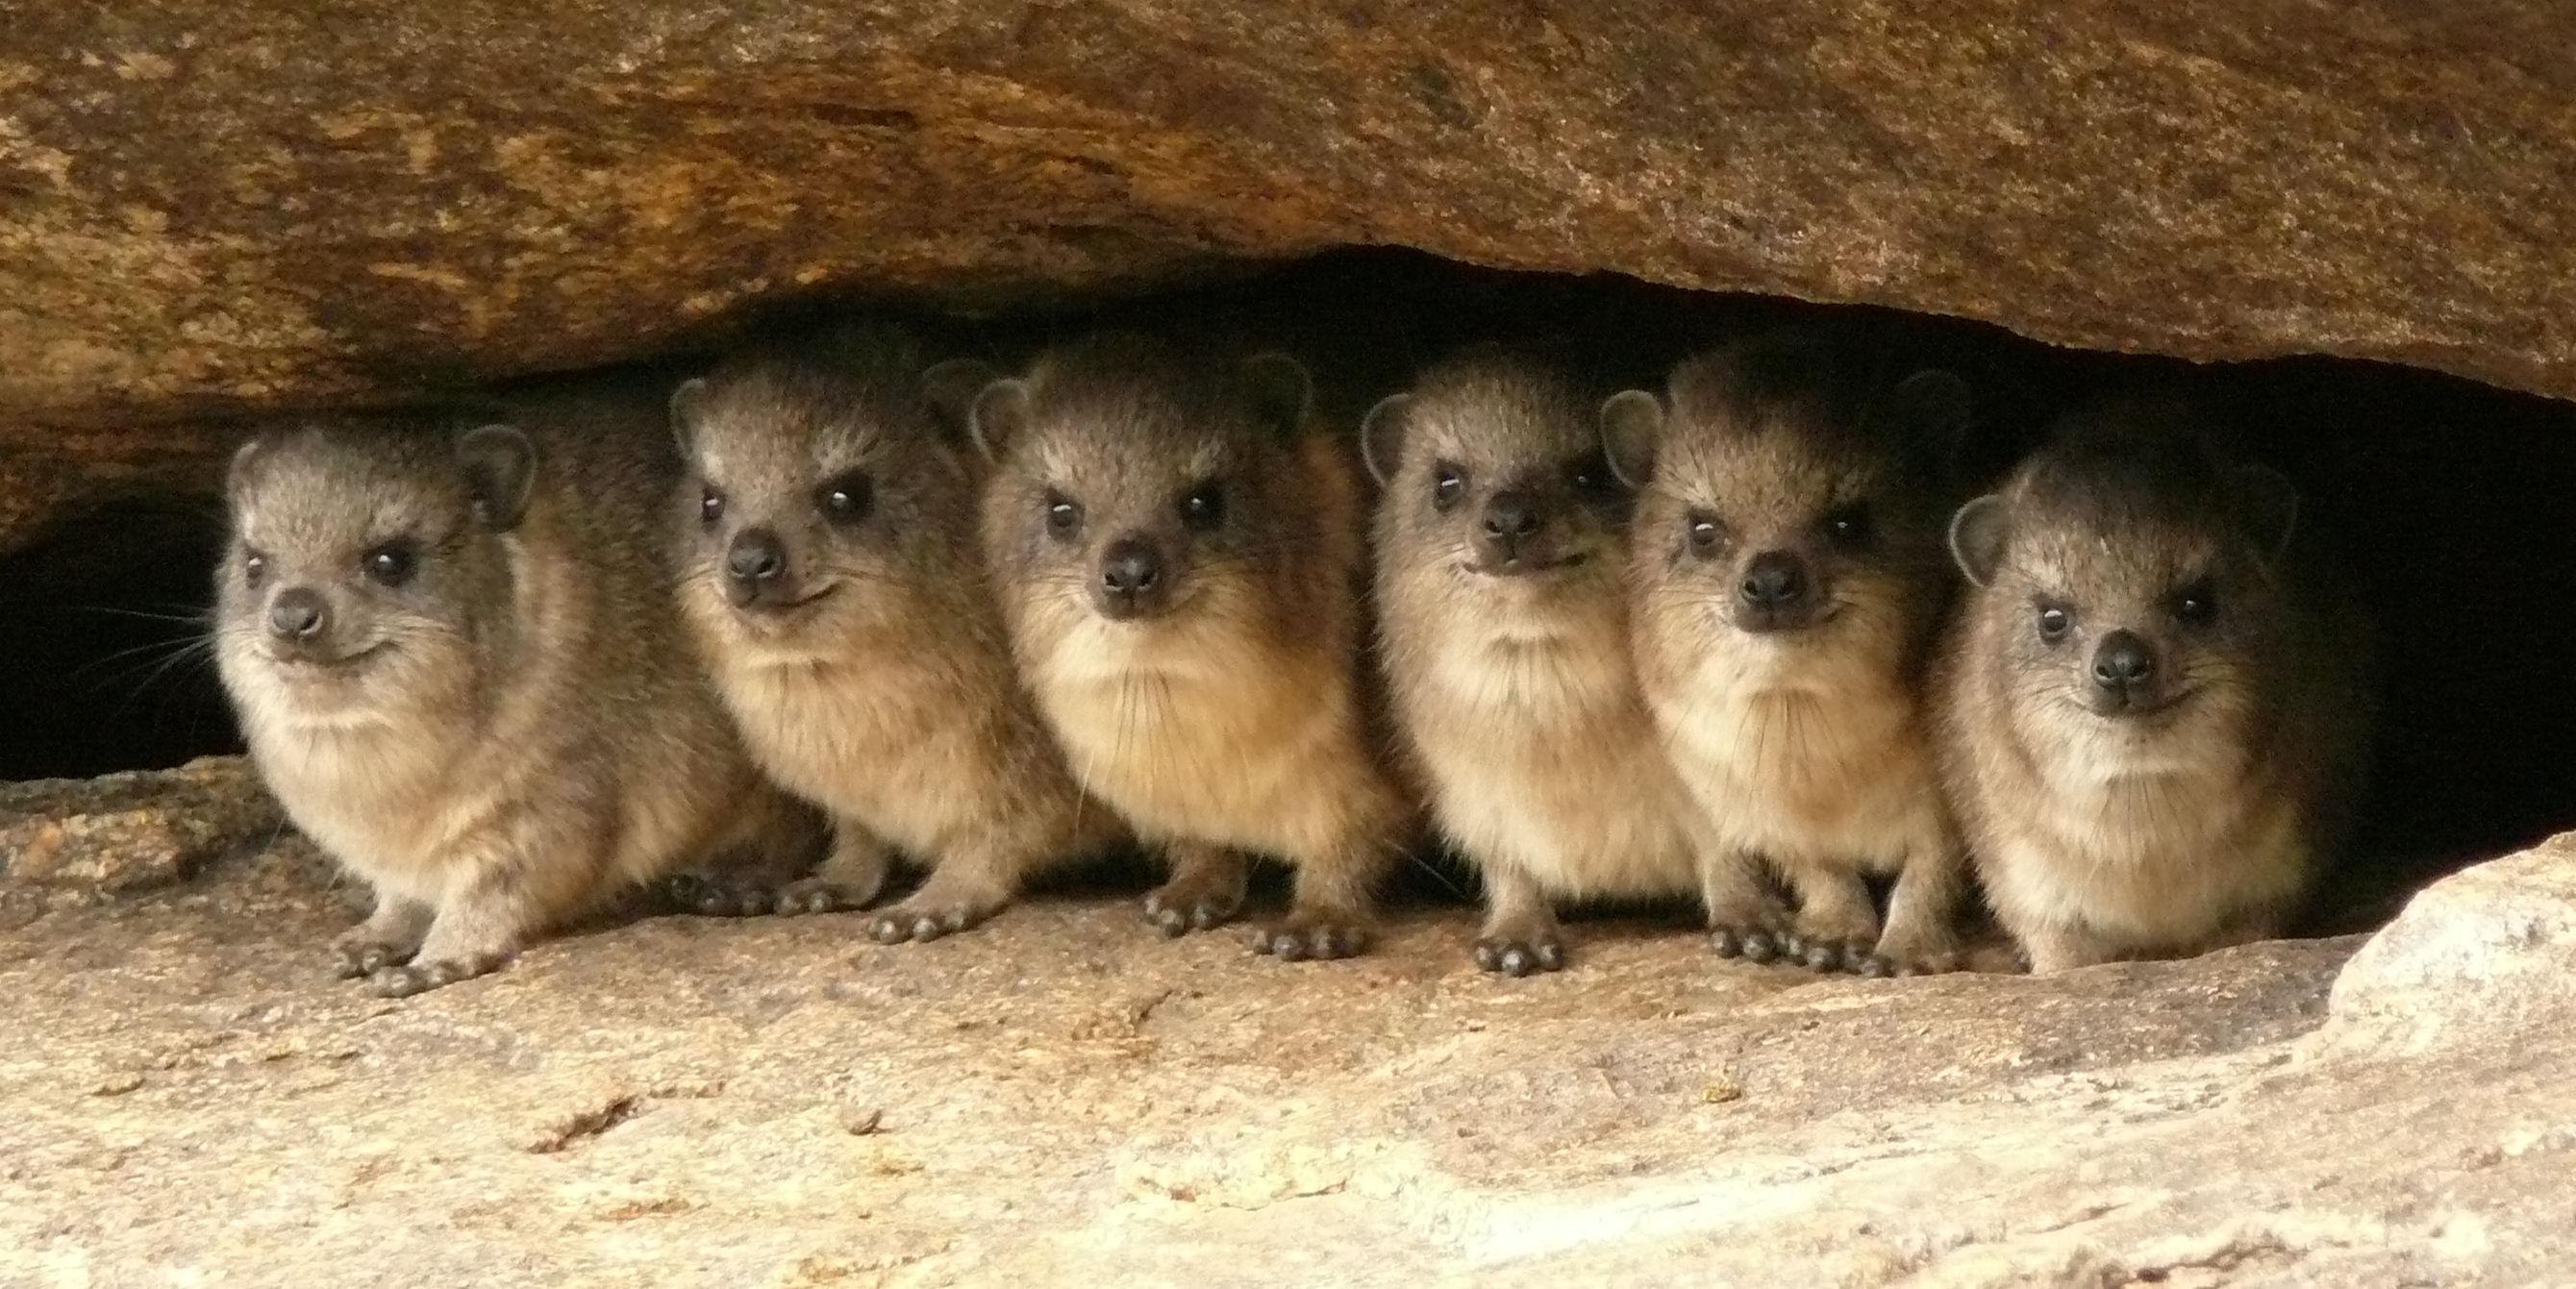 hyrax kır sıçanı kaya porsuğu gülen hayvan sevimli rock-hyrax.jpg